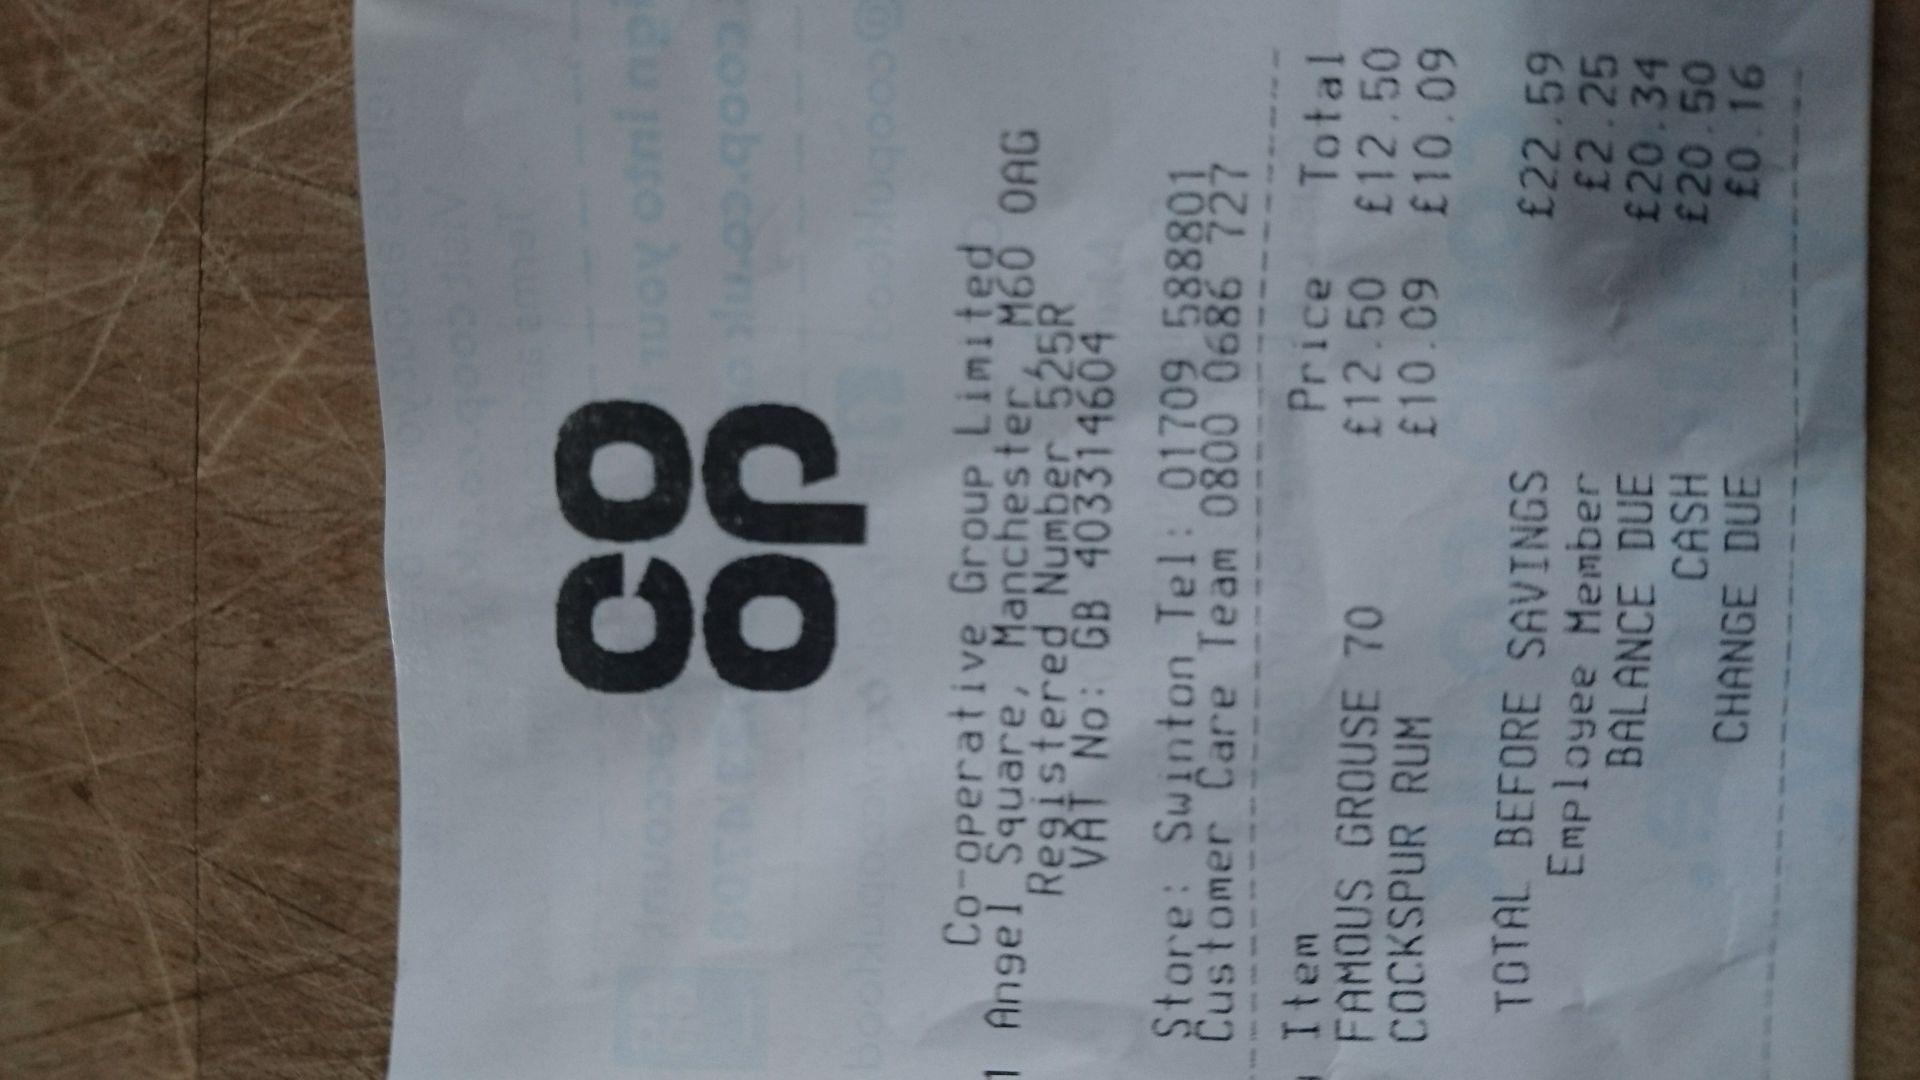 Cockspur 70cl - £10.09 at Co-op instore